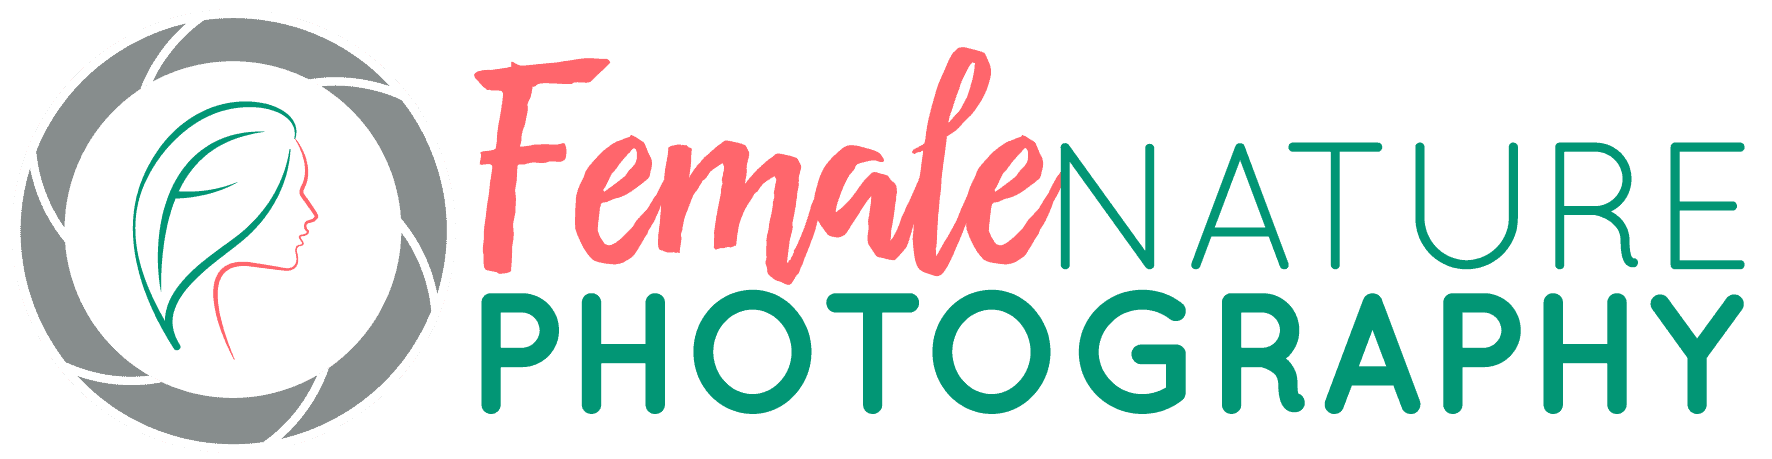 FEMALE NATURE PHOTOGRAPHY ALT TEXT